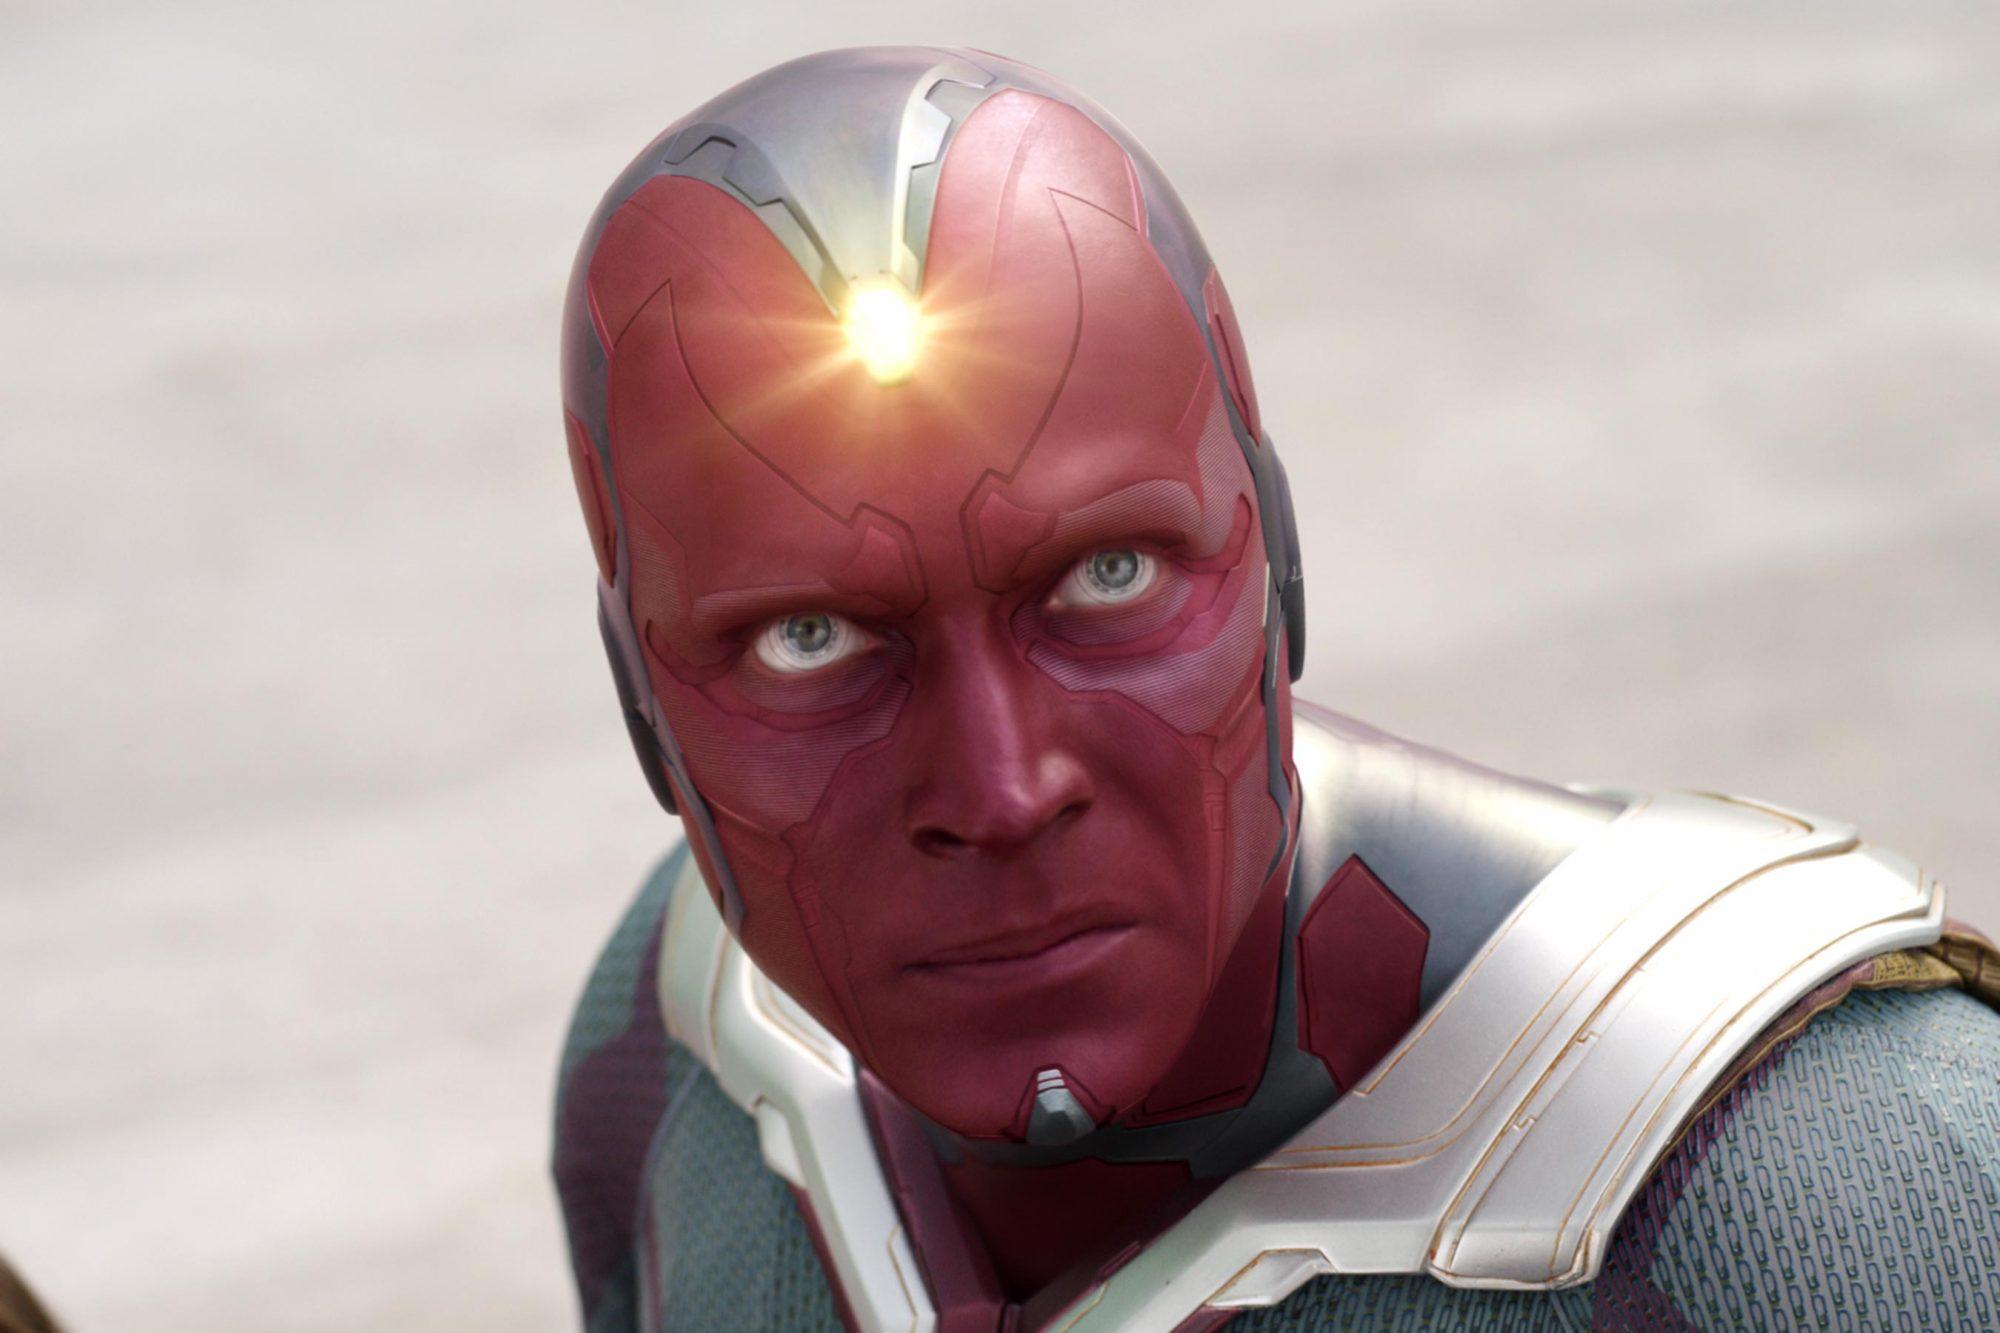 Marvel's Captain America: Civil War (2016)Vision (Paul Bettany)